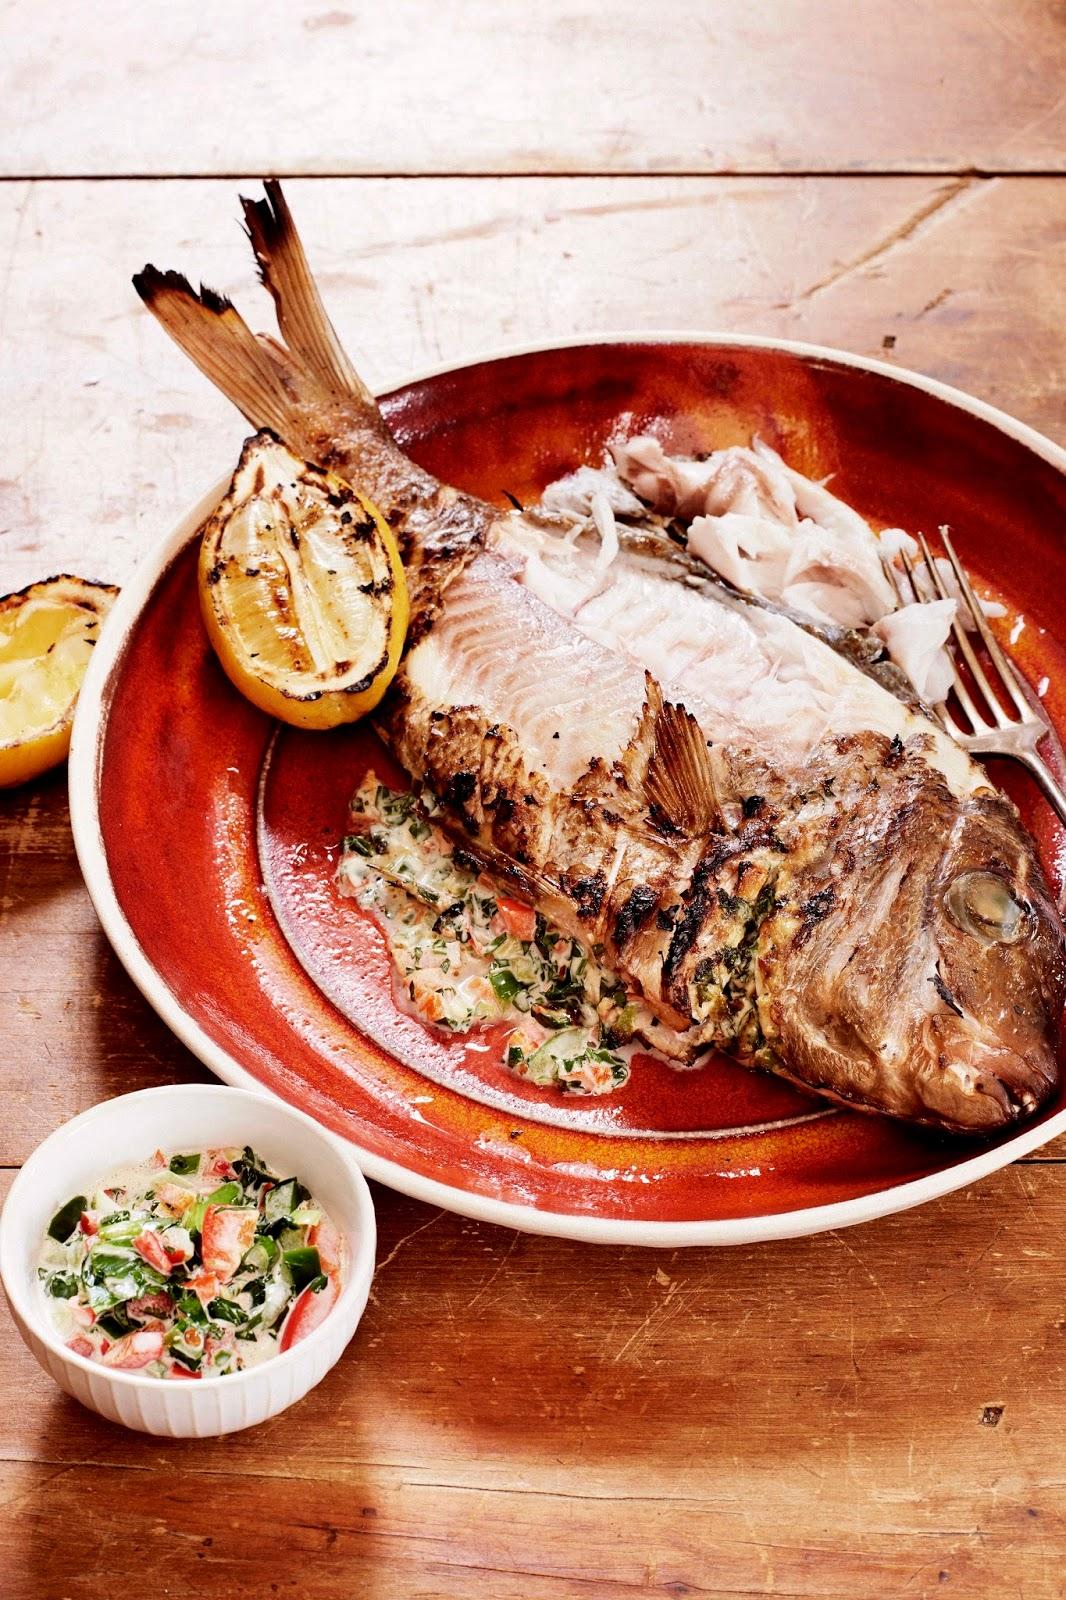 Chimichurra Fire Fish With Smoked Chimmichurri Mayo...